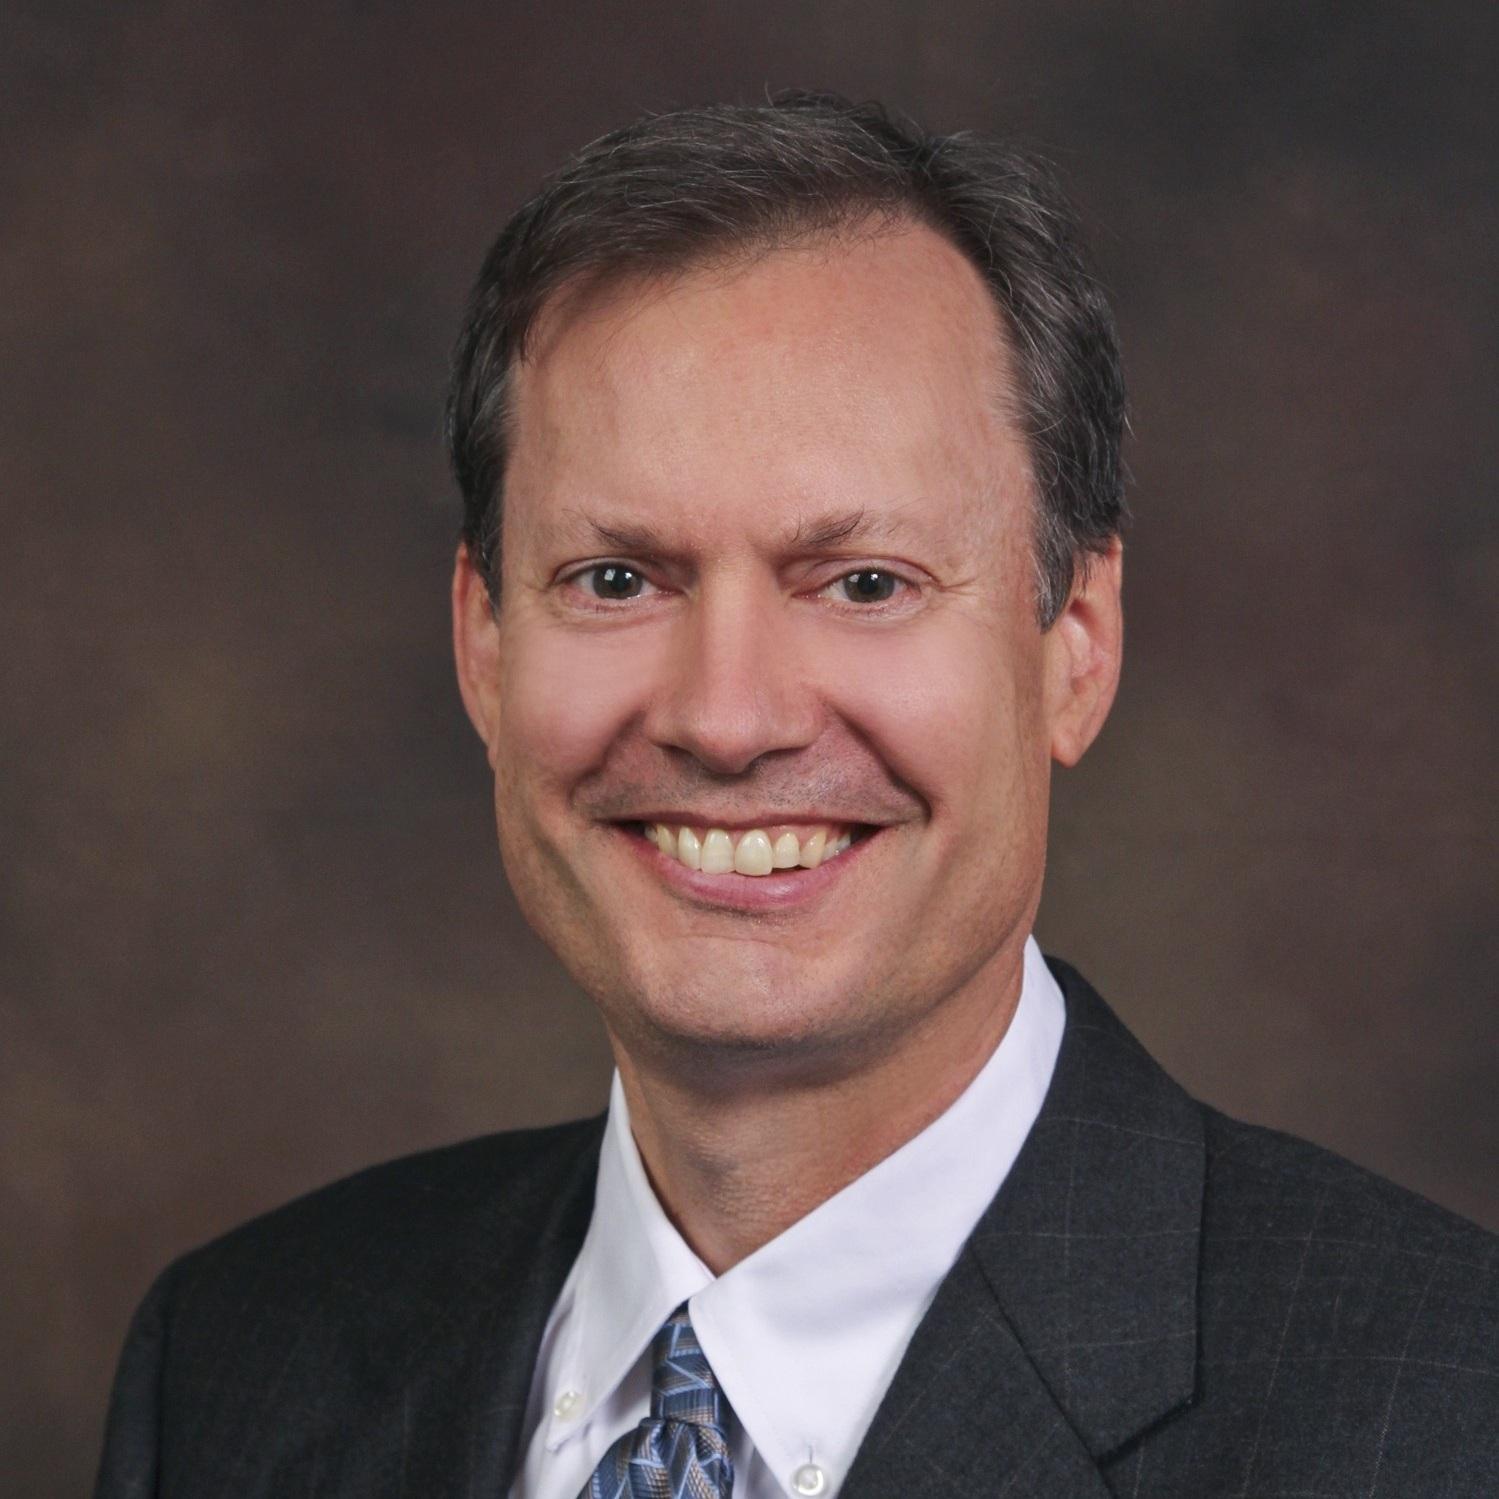 Philip B. Palmer